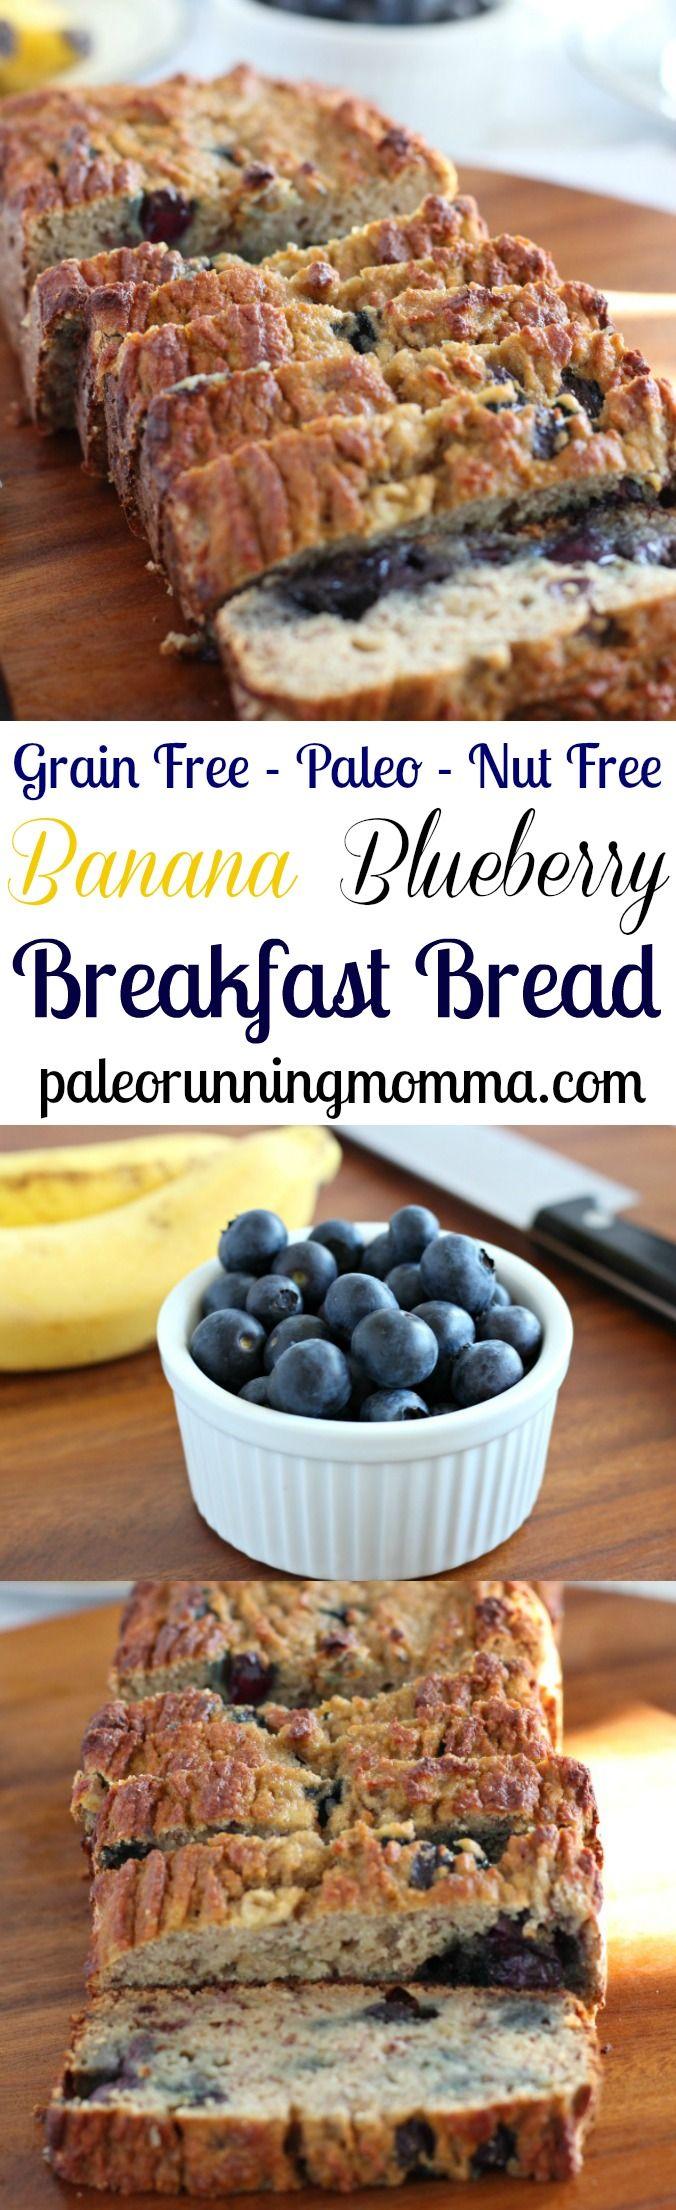 Banana Blueberry Breakfast Bread (Paleo & Nut Free) Banana Blueberry Breakfast Bread -